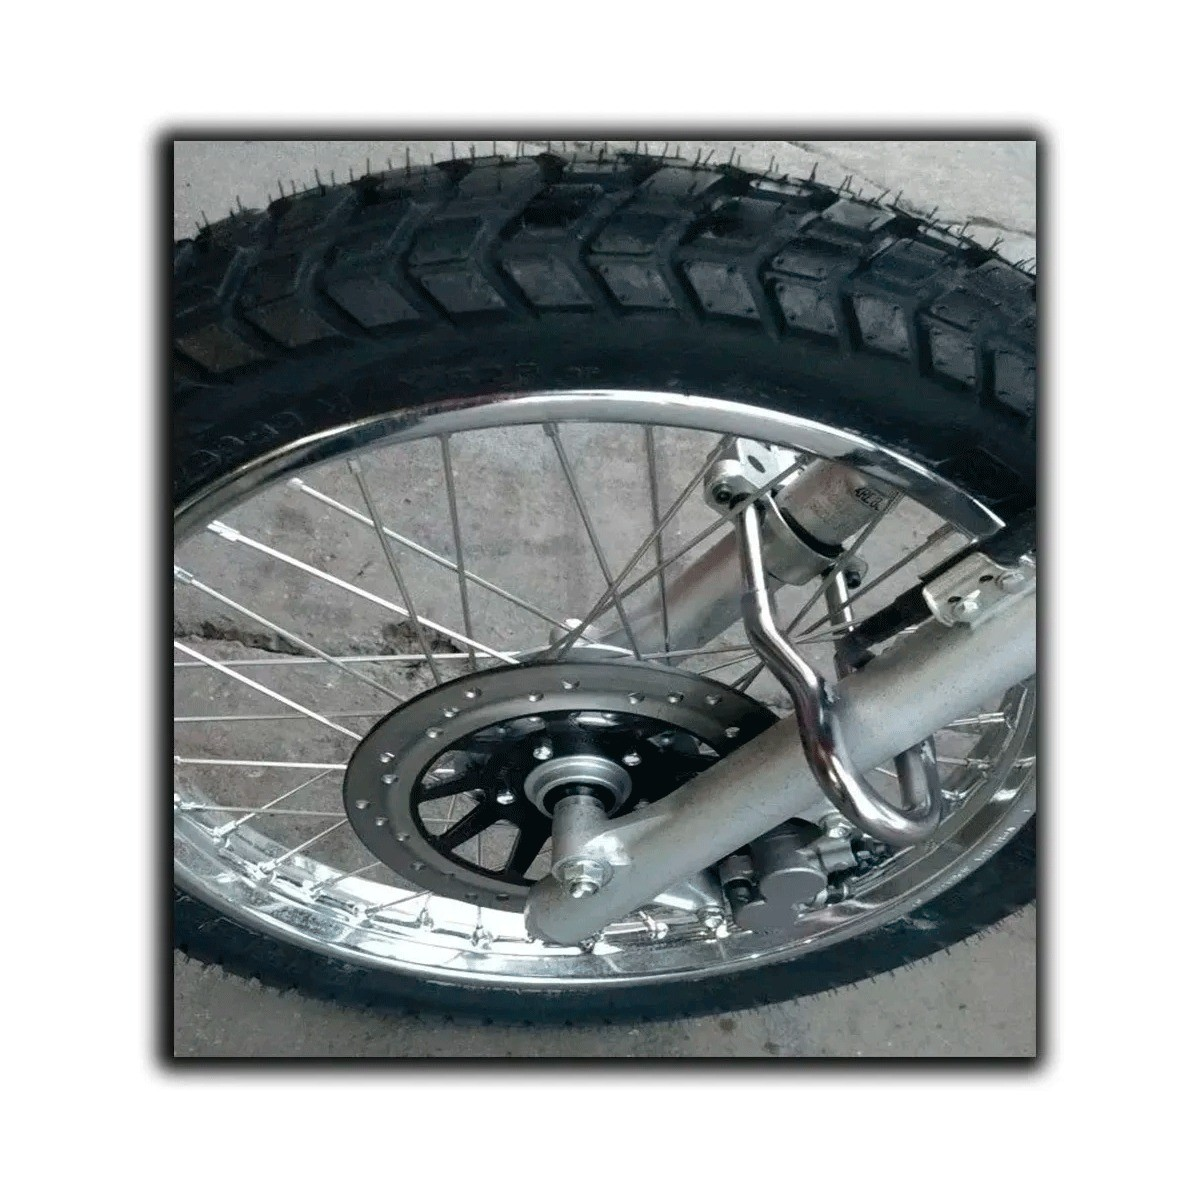 Tranca Trava Segurança Anti Furto Moto honda Biz 100/ Biz 125 pop 100 110